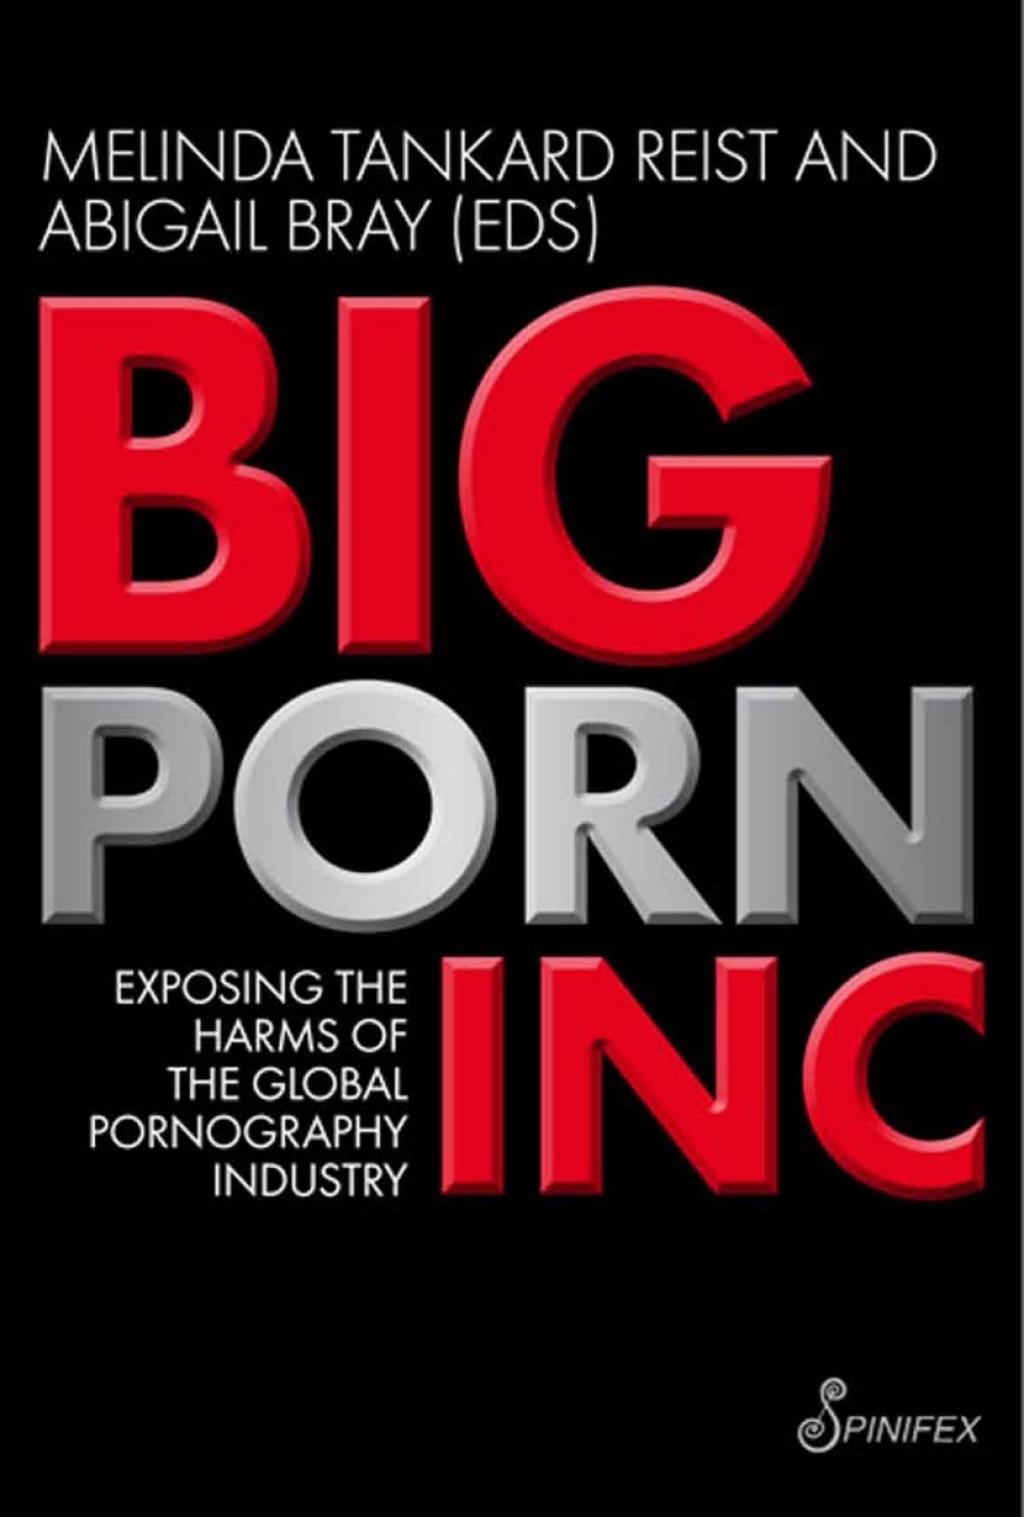 Big Porn Inc (ebook) eBooks